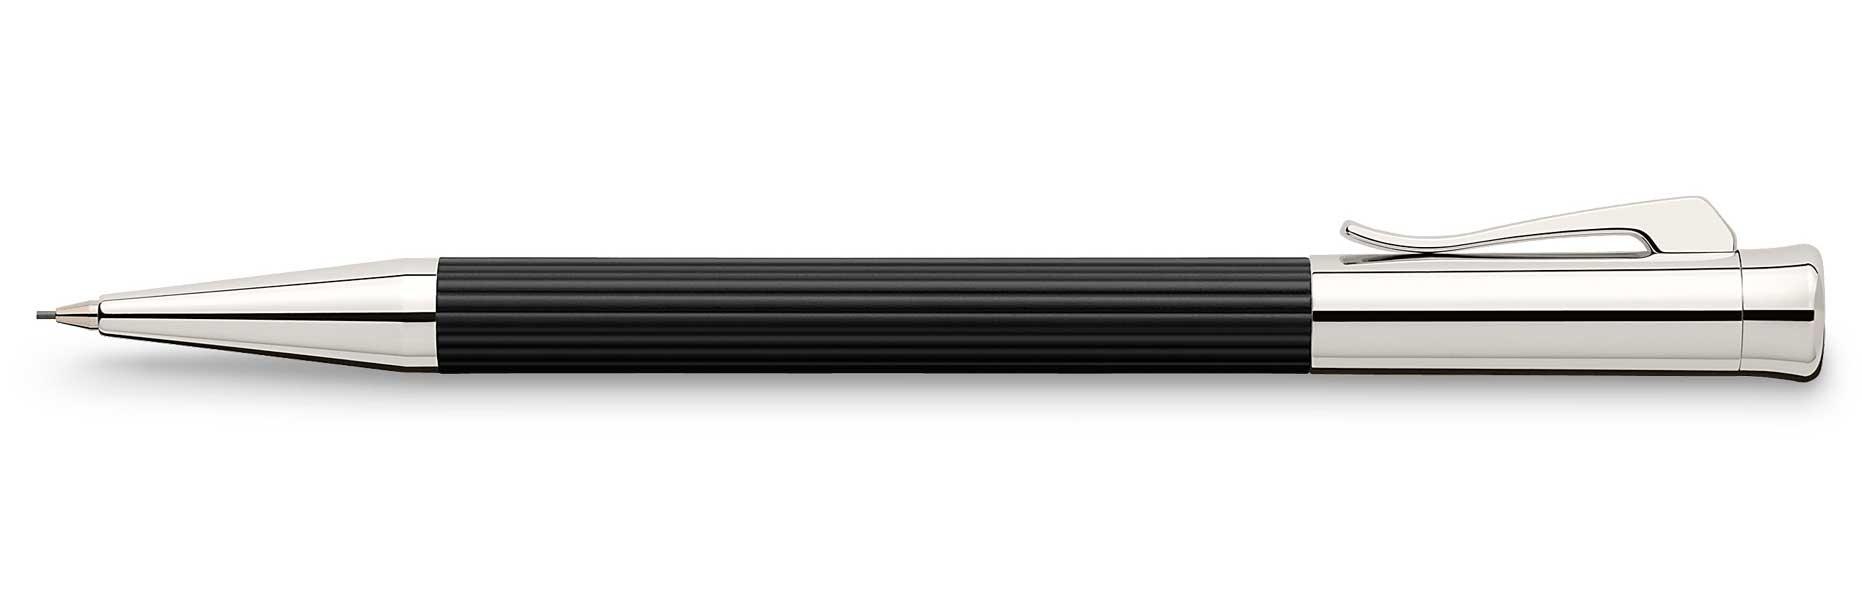 Механический карандаш Graf von Faber-Castell Tamitio Black